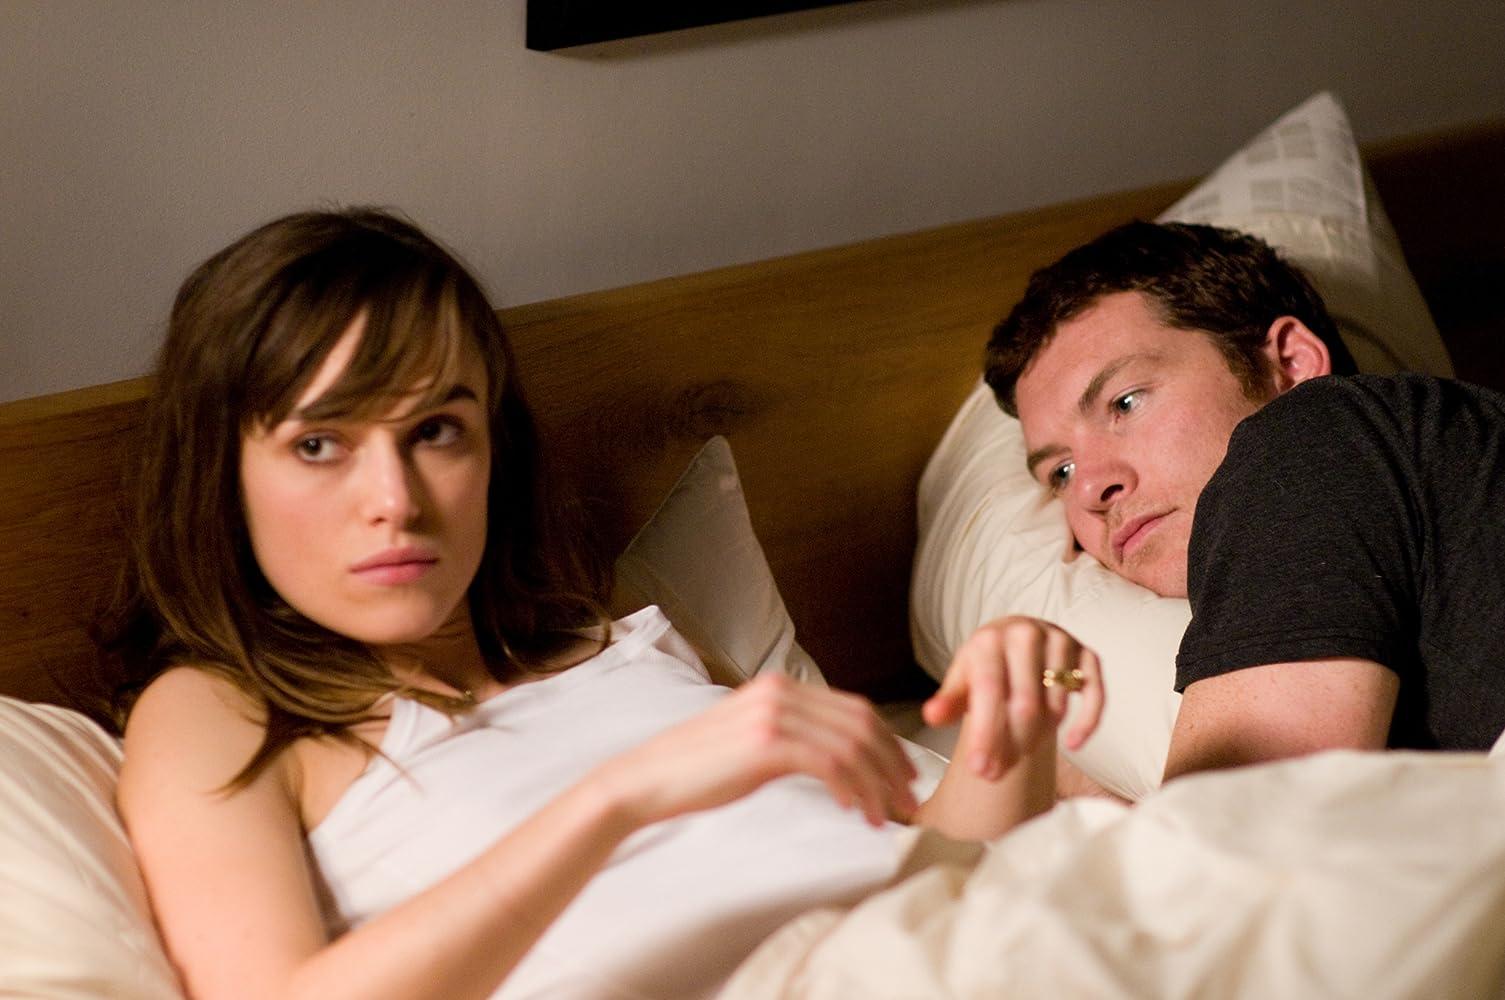 Отъеб жен мужьями смотреть онлайн